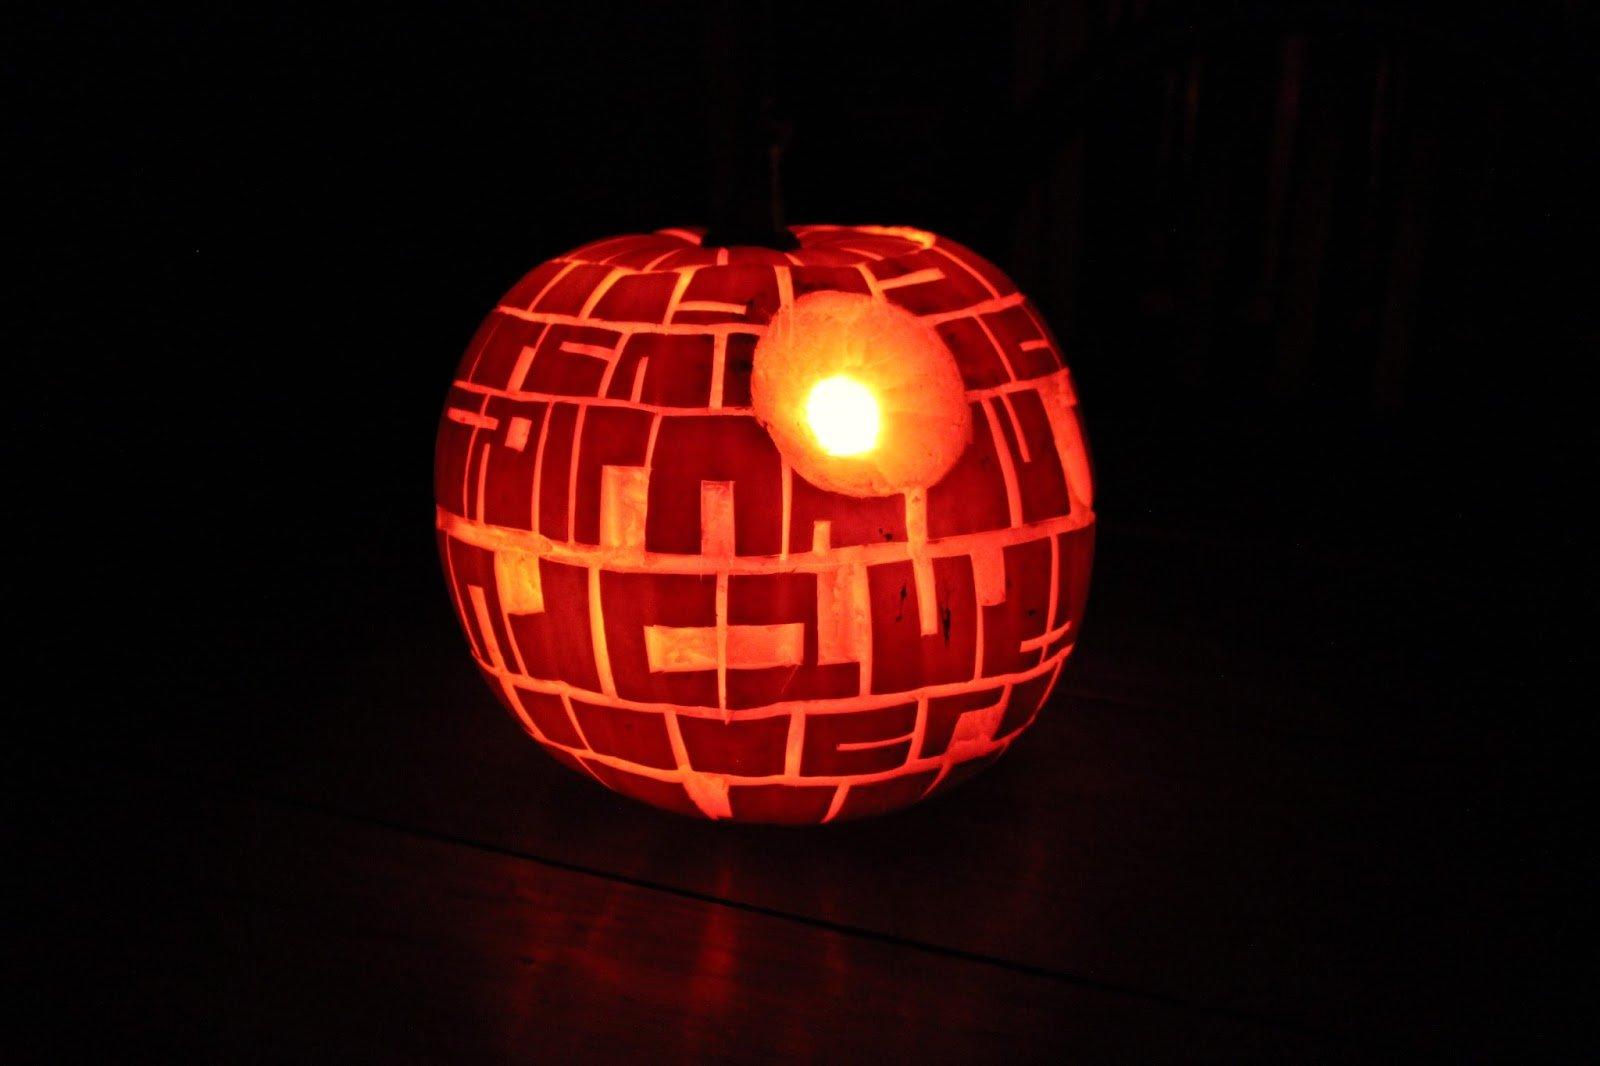 Most Inspiring Wallpaper Halloween Star Wars - fbdbf50ae5f91c342a11ef5d8c824736  Collection_76755.jpg